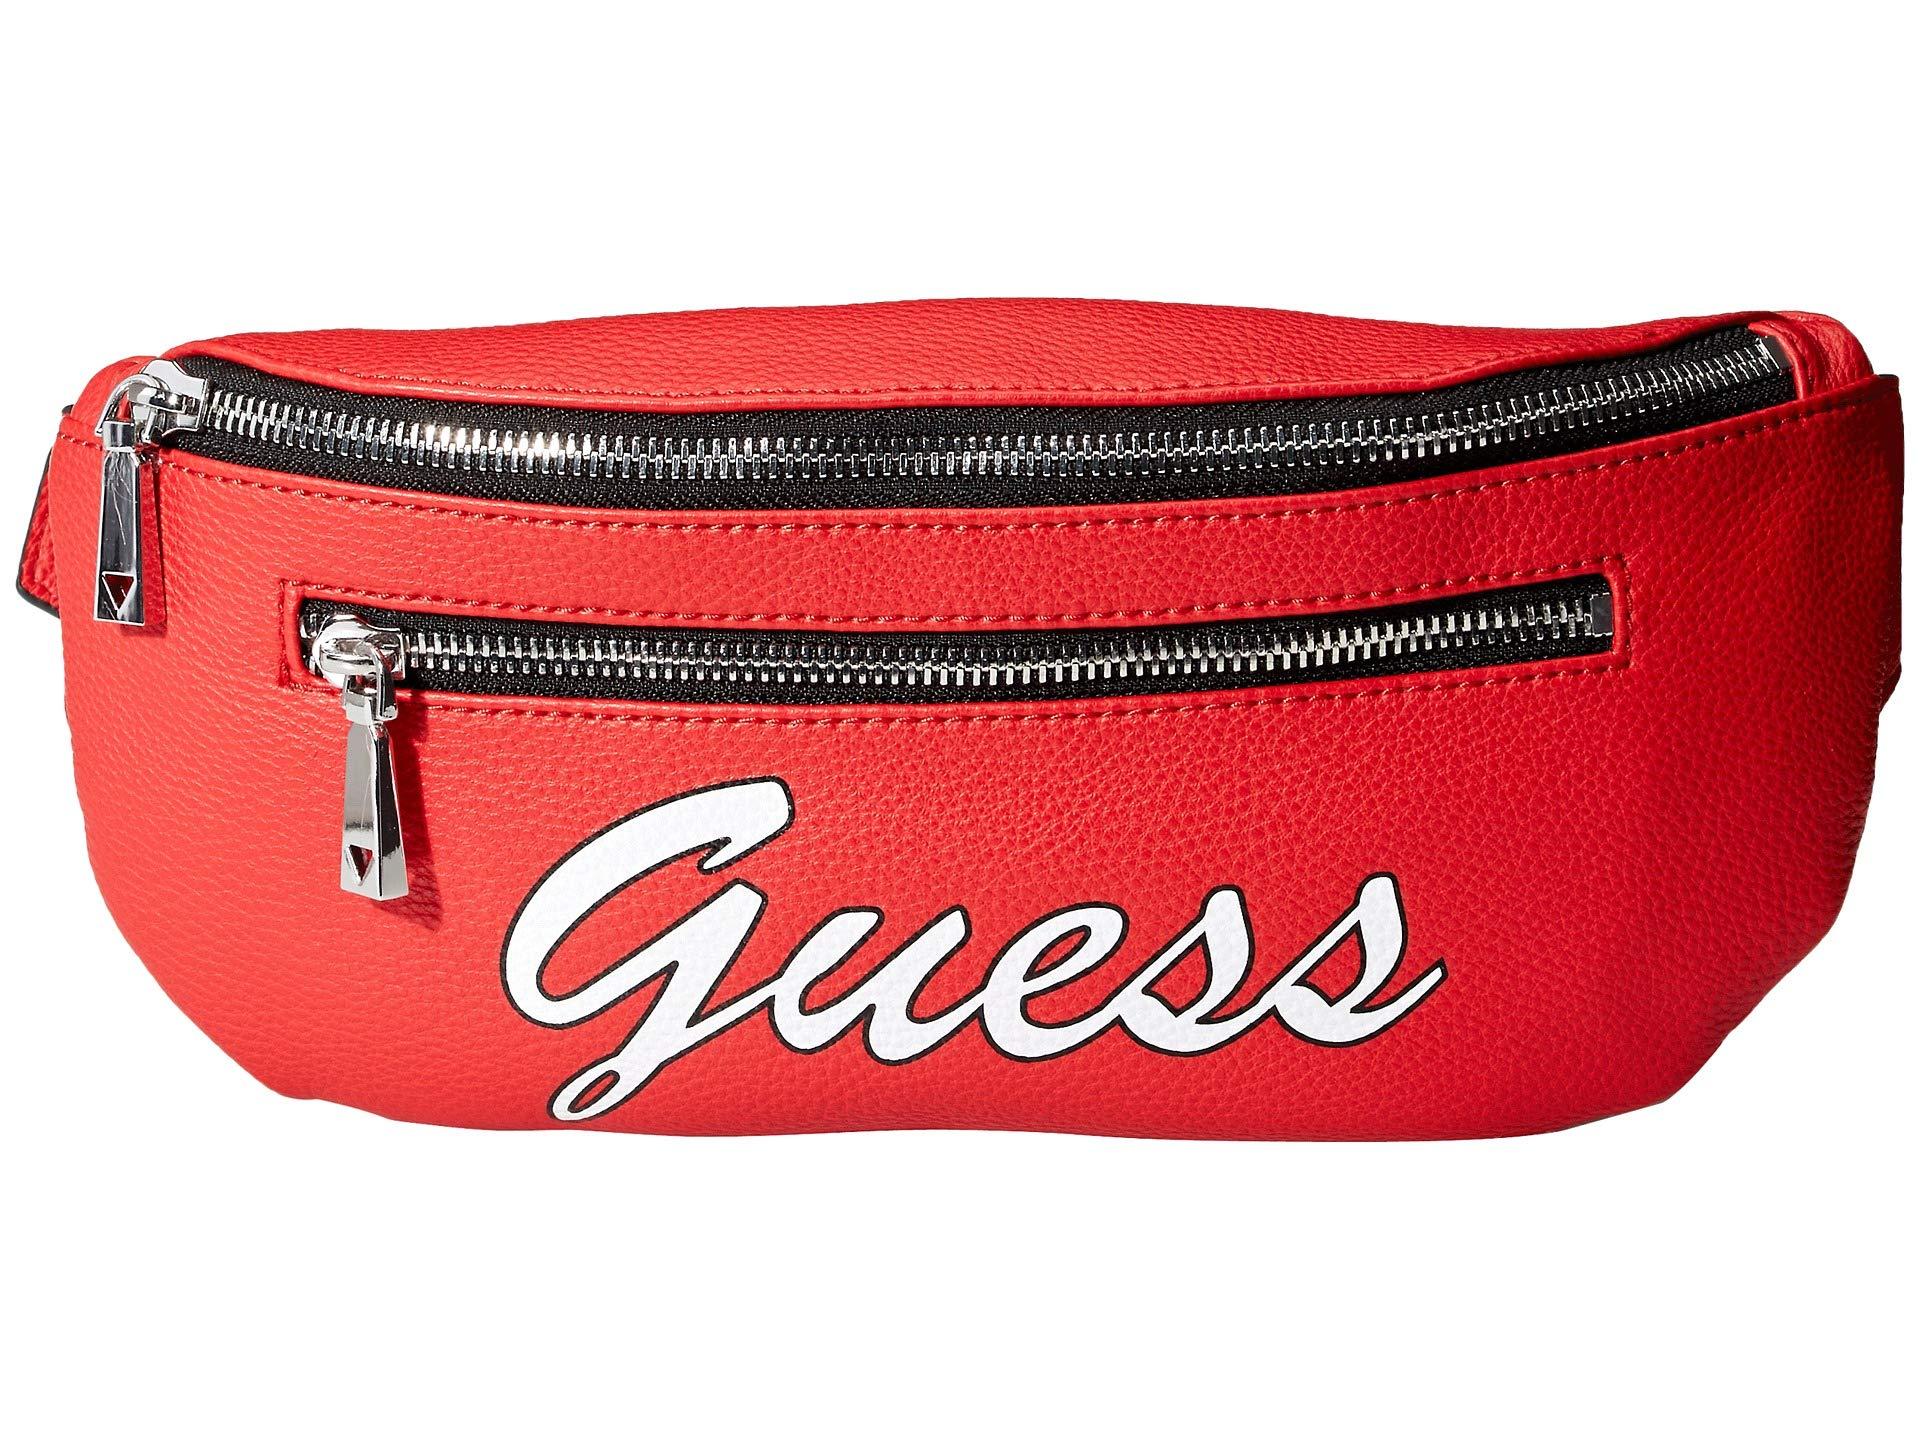 GUESS GUESS Skools Out Belt Bag